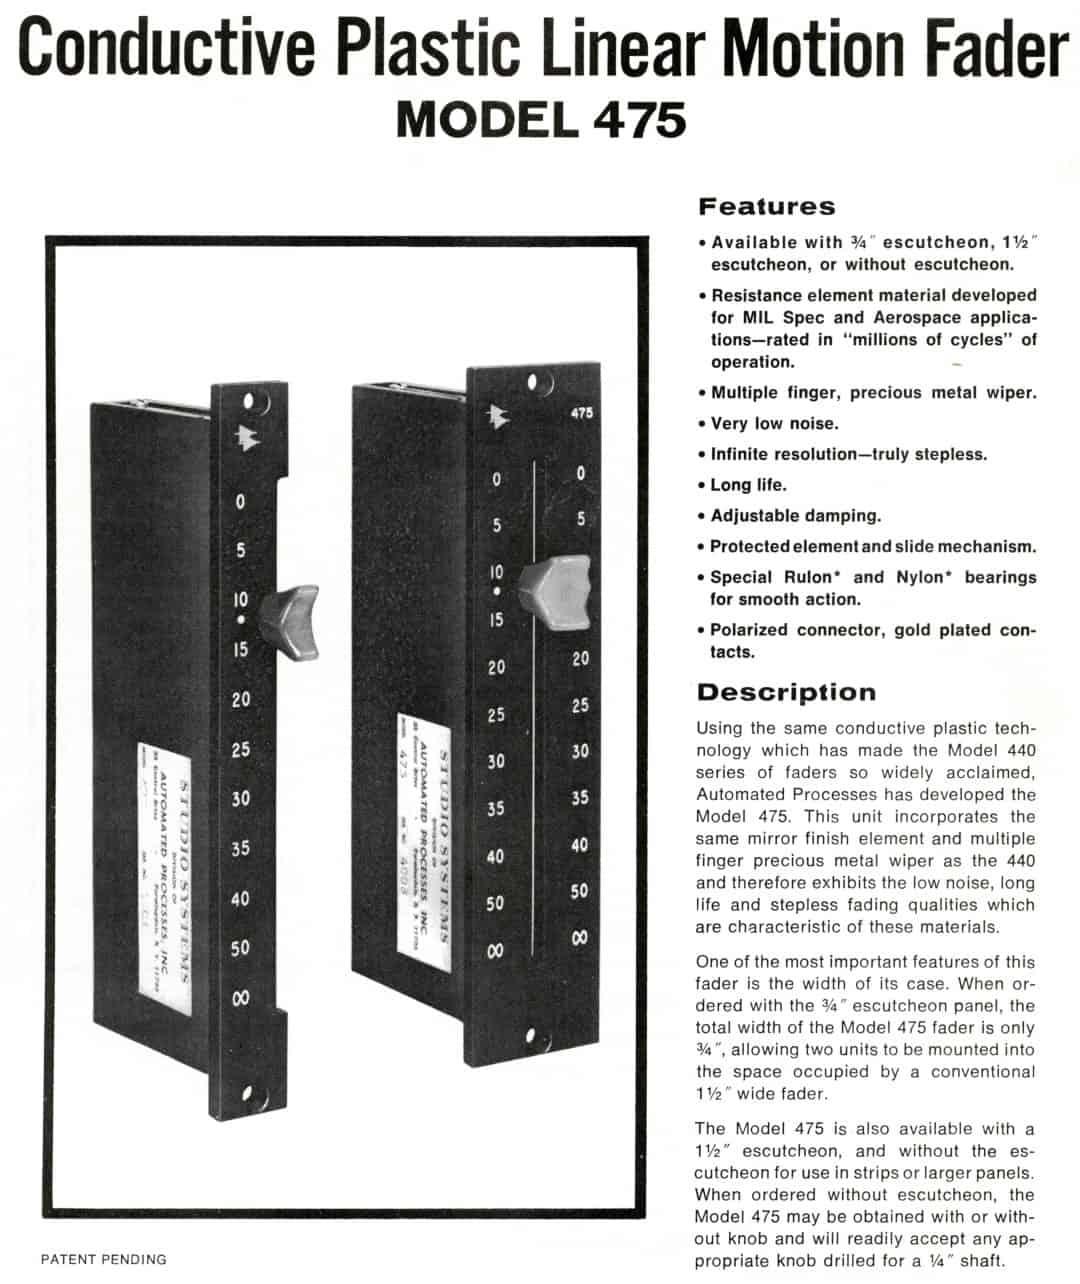 API 475 Brochure